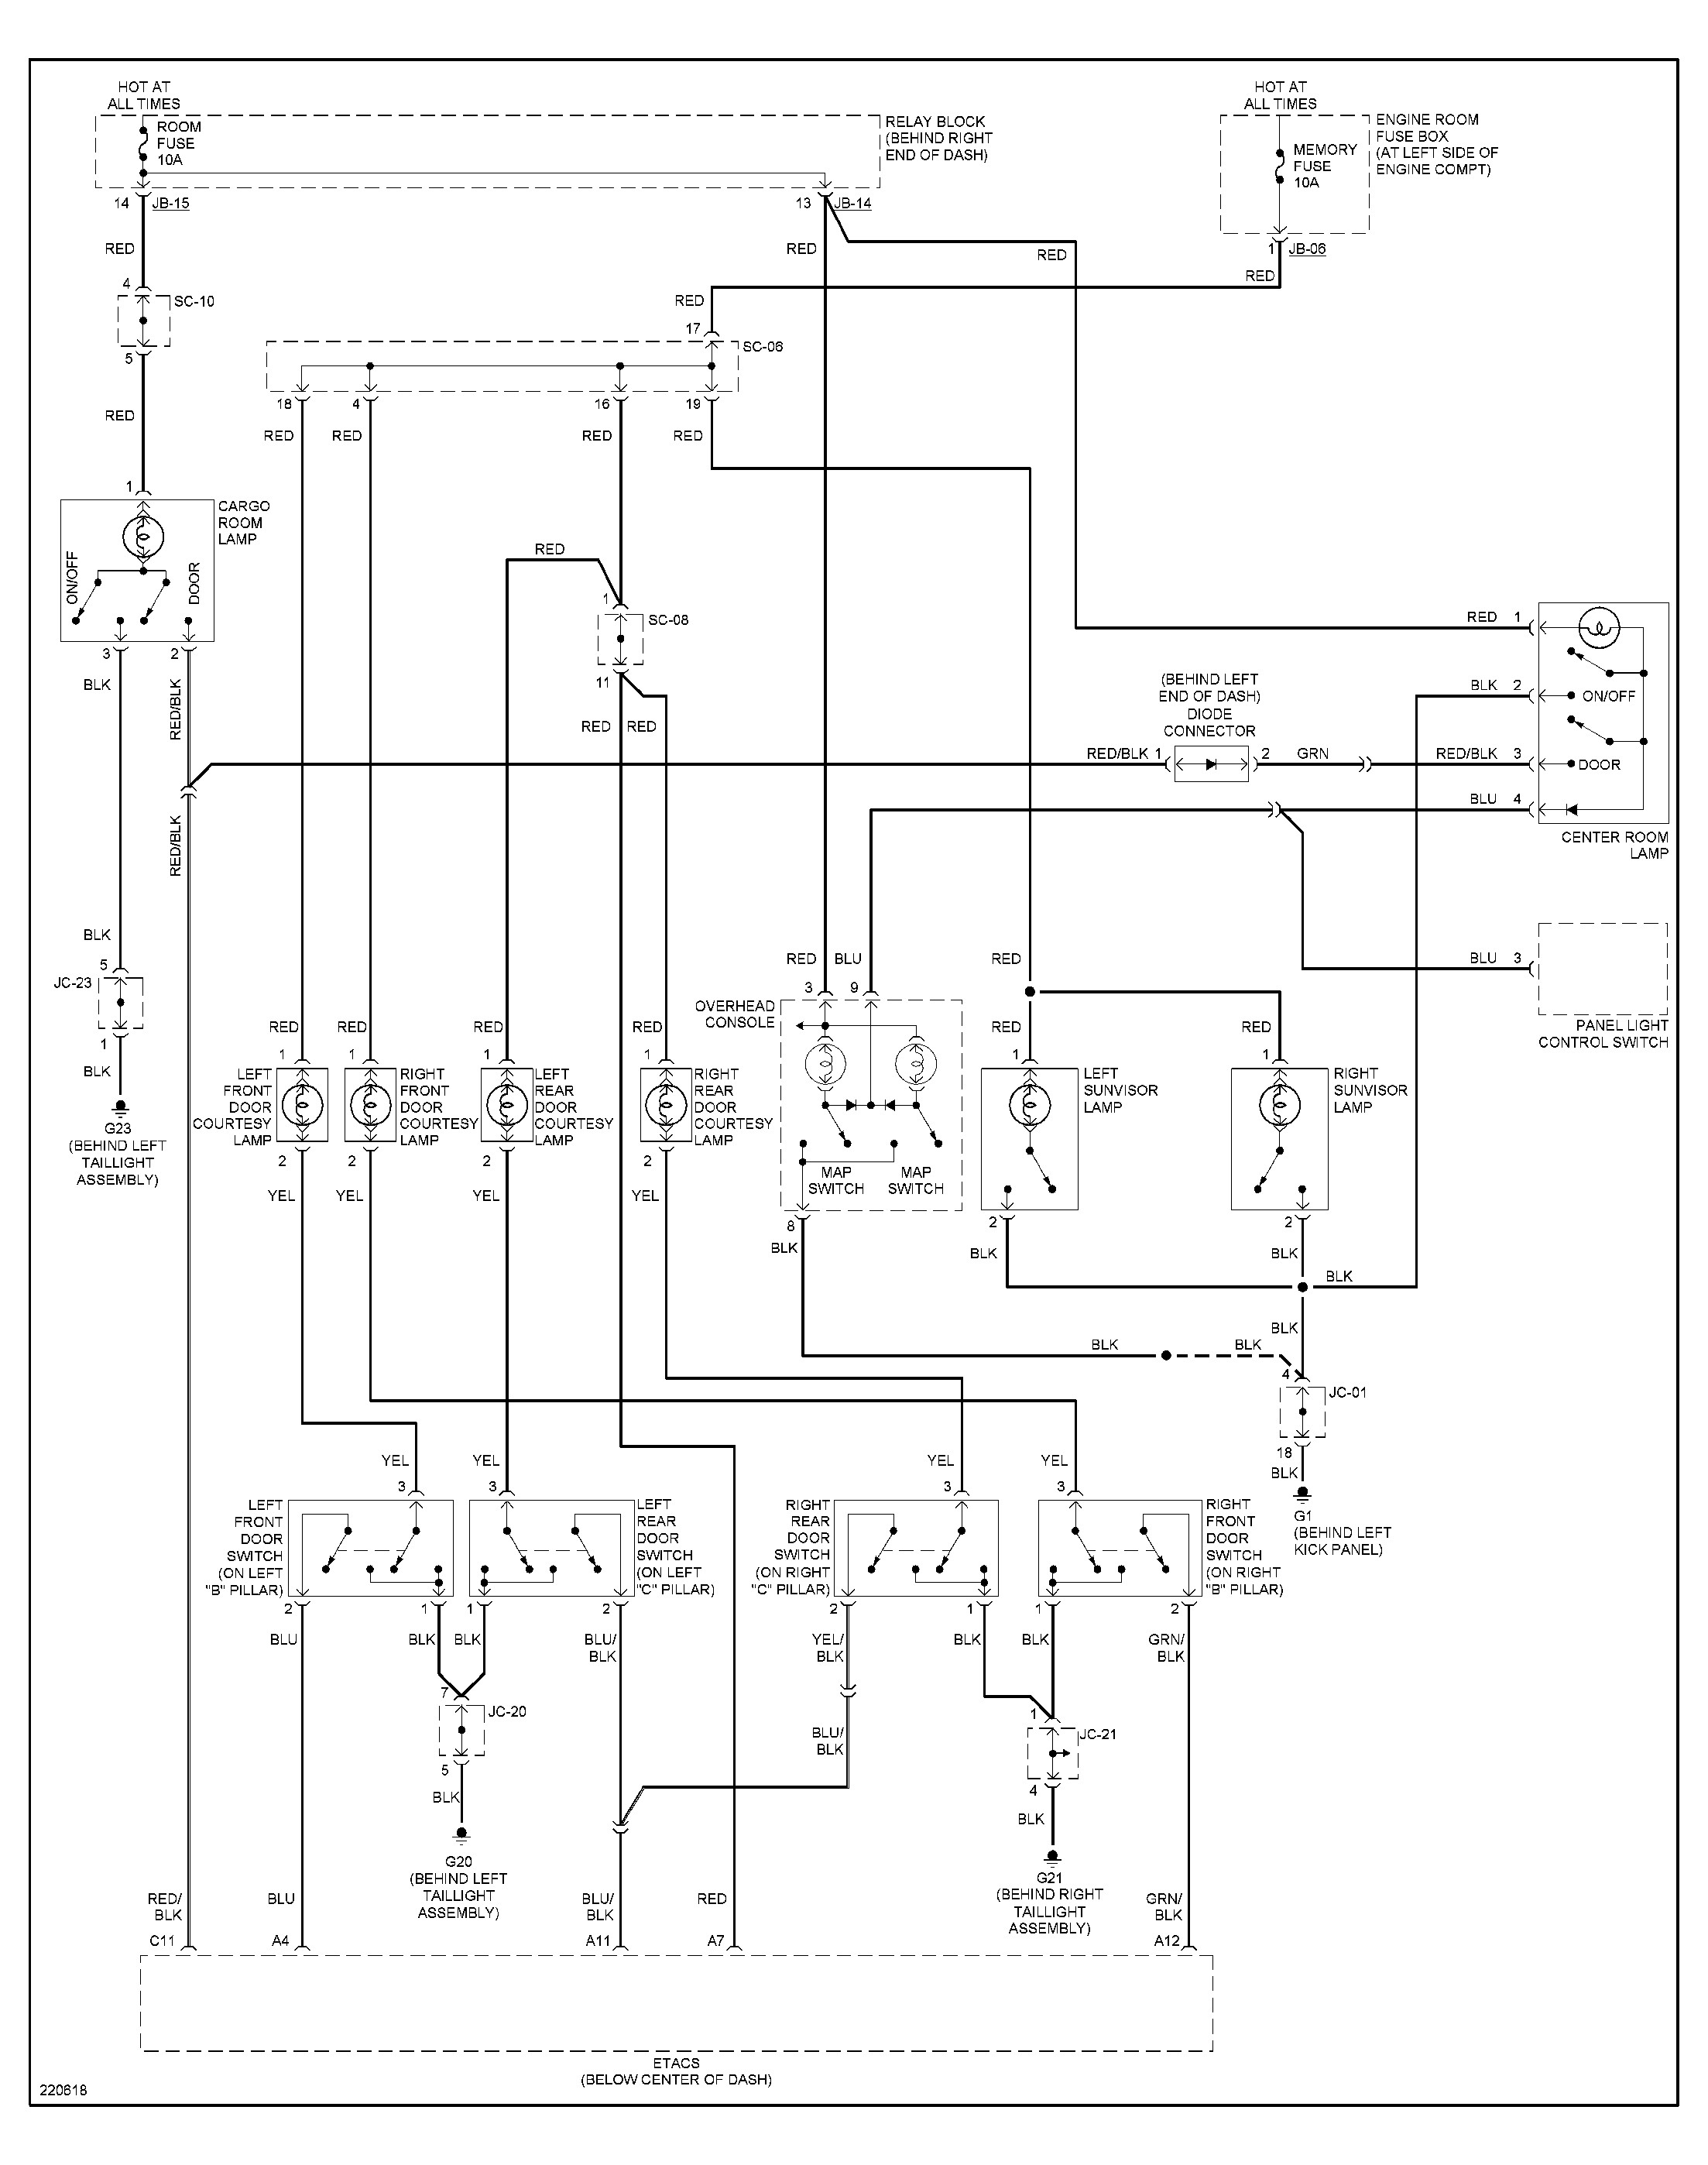 2006 kia sedona radio wiring diagram vf 2562  wiring diagram furthermore 2006 kia sorento radio wiring  wiring diagram furthermore 2006 kia